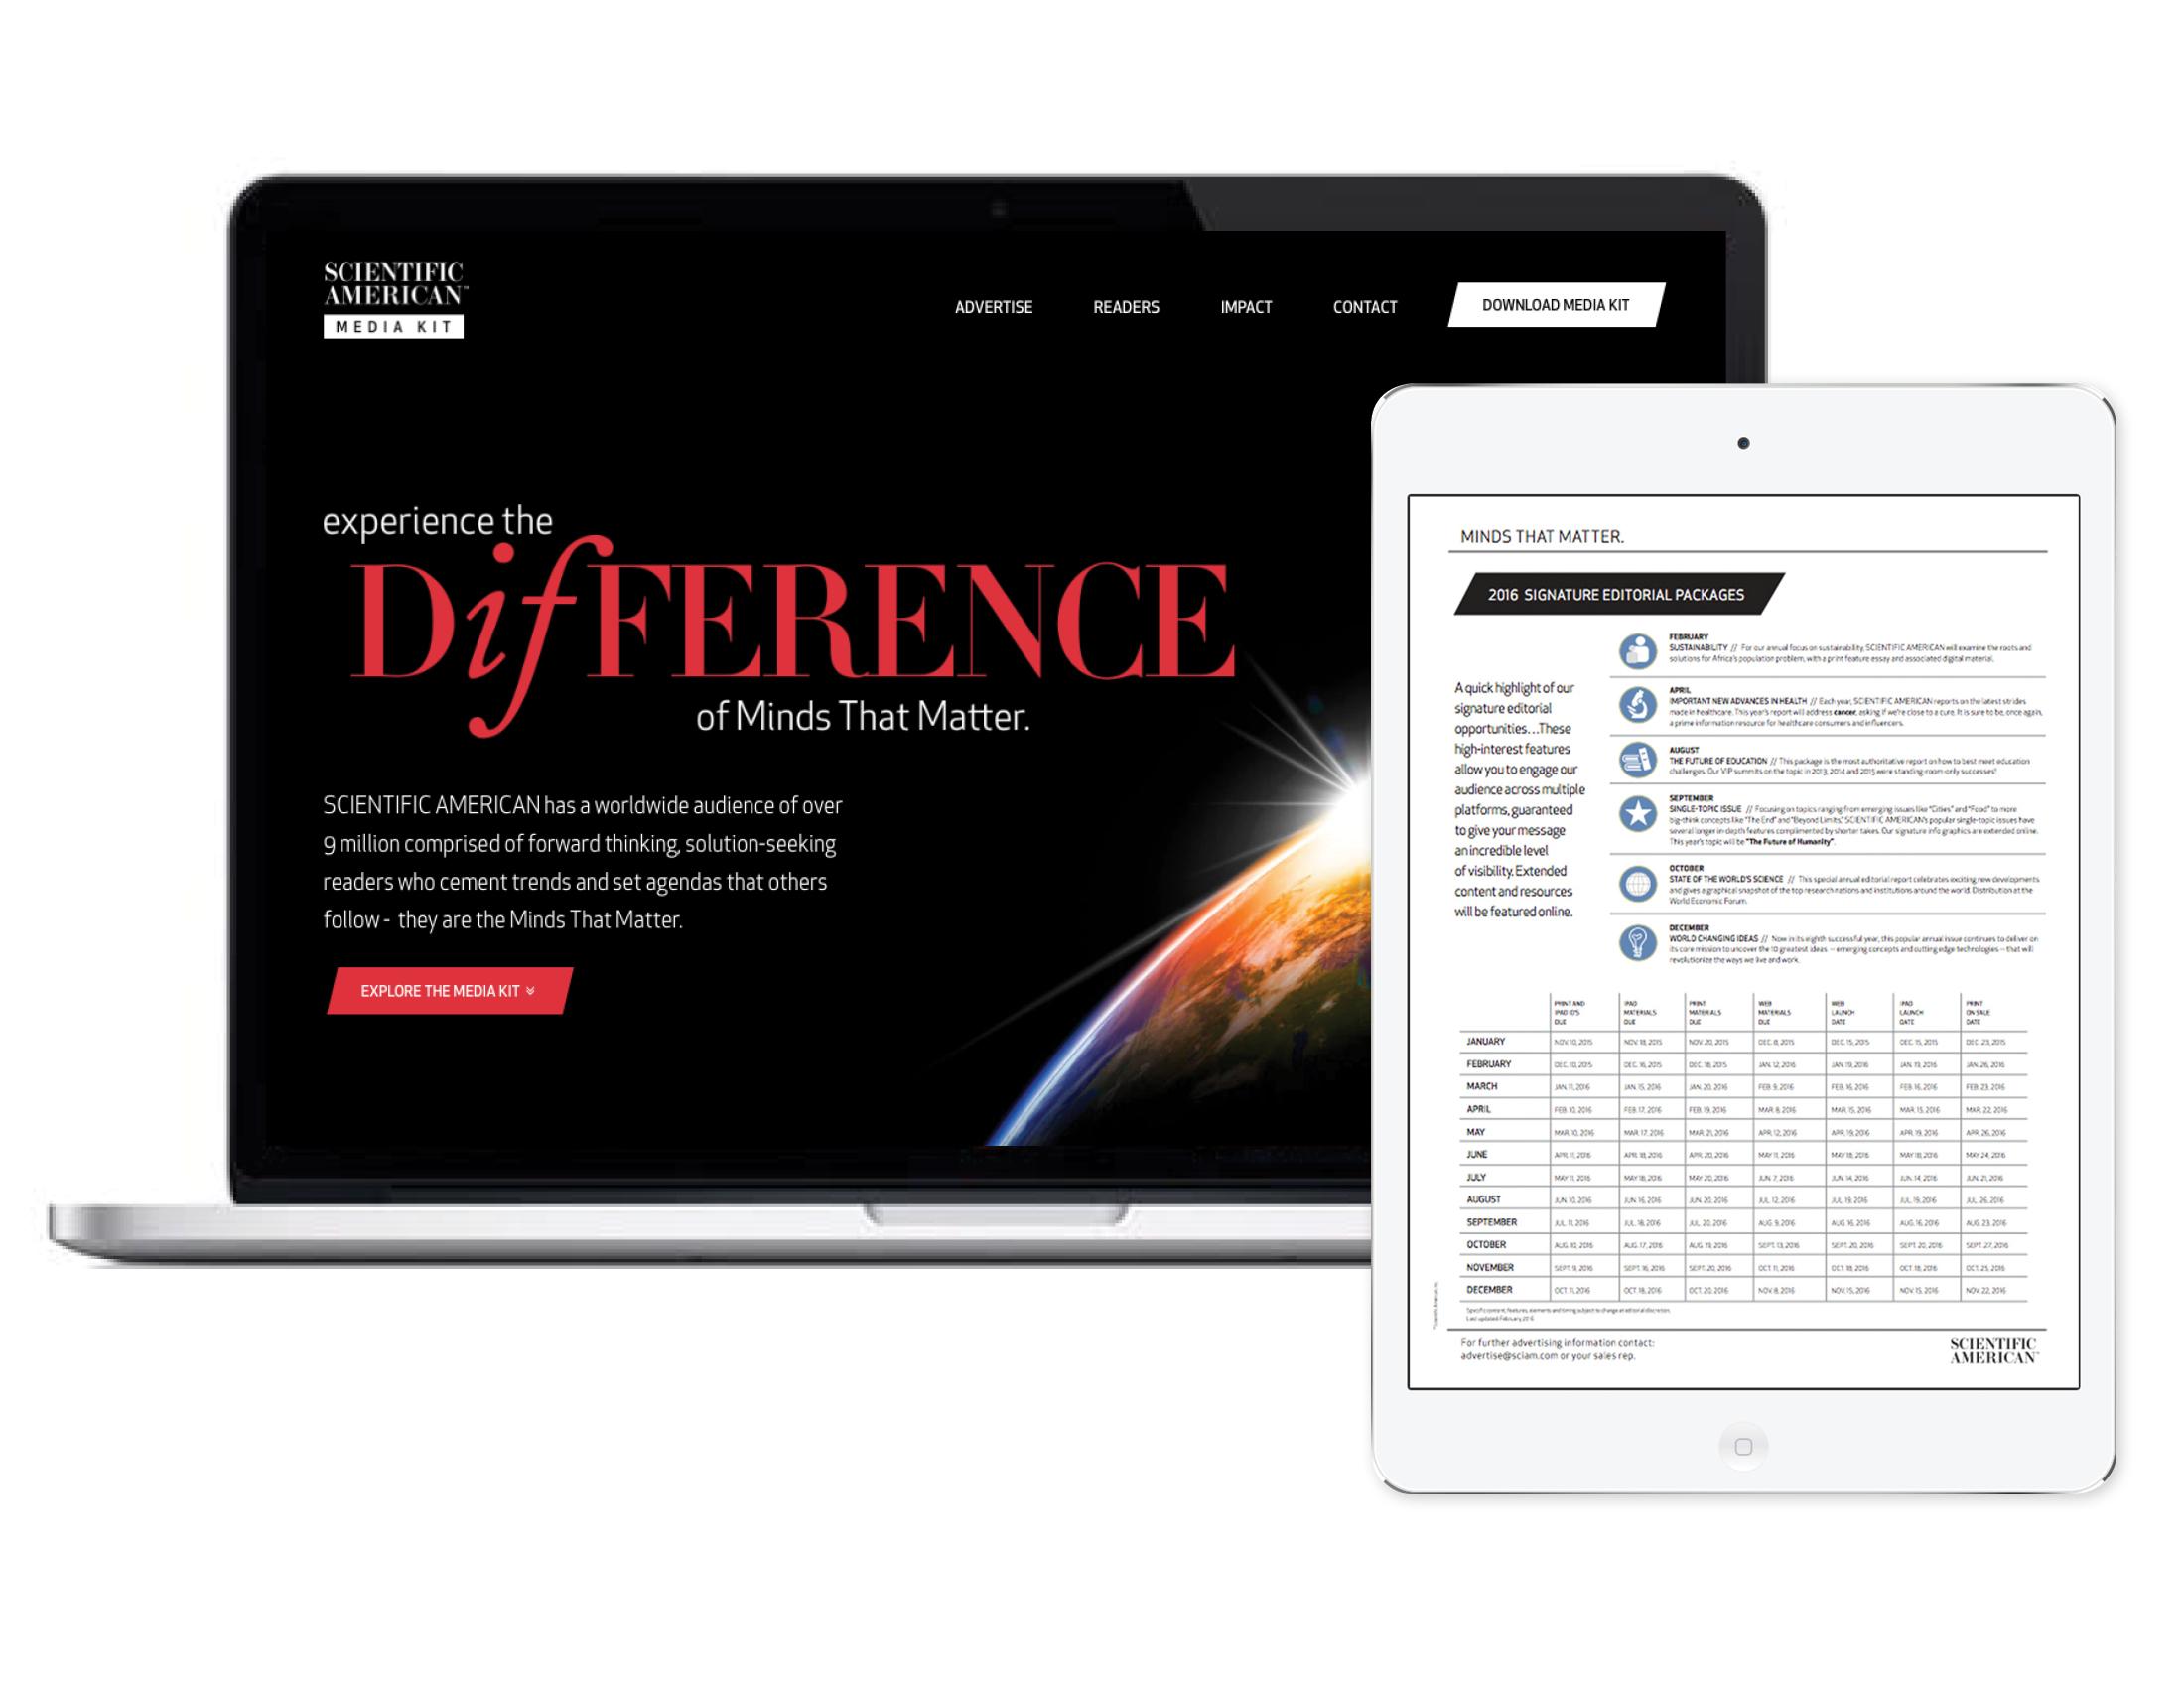 Scientific America Media Kit Homepage